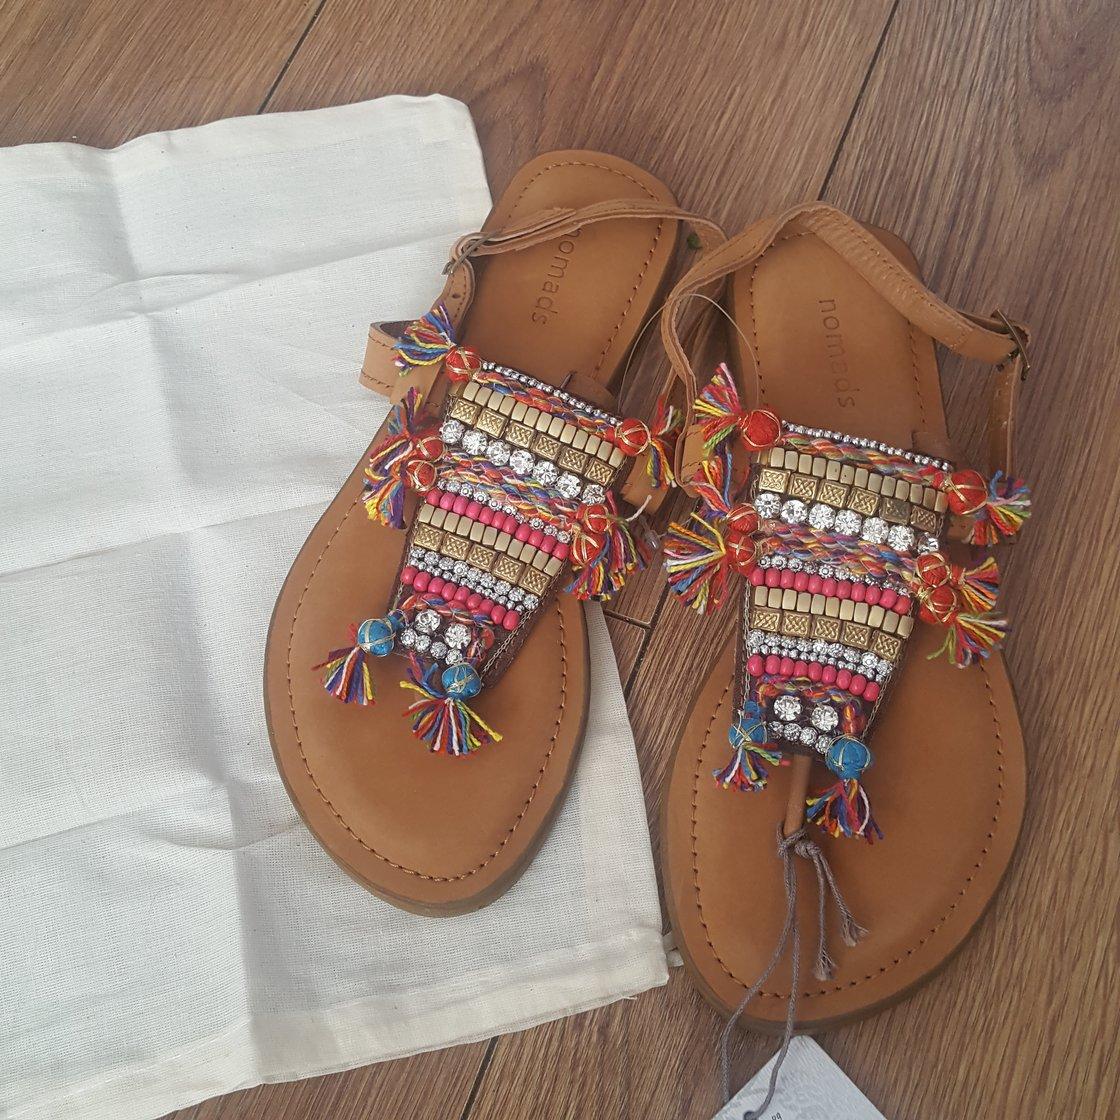 Image of Bali sandals